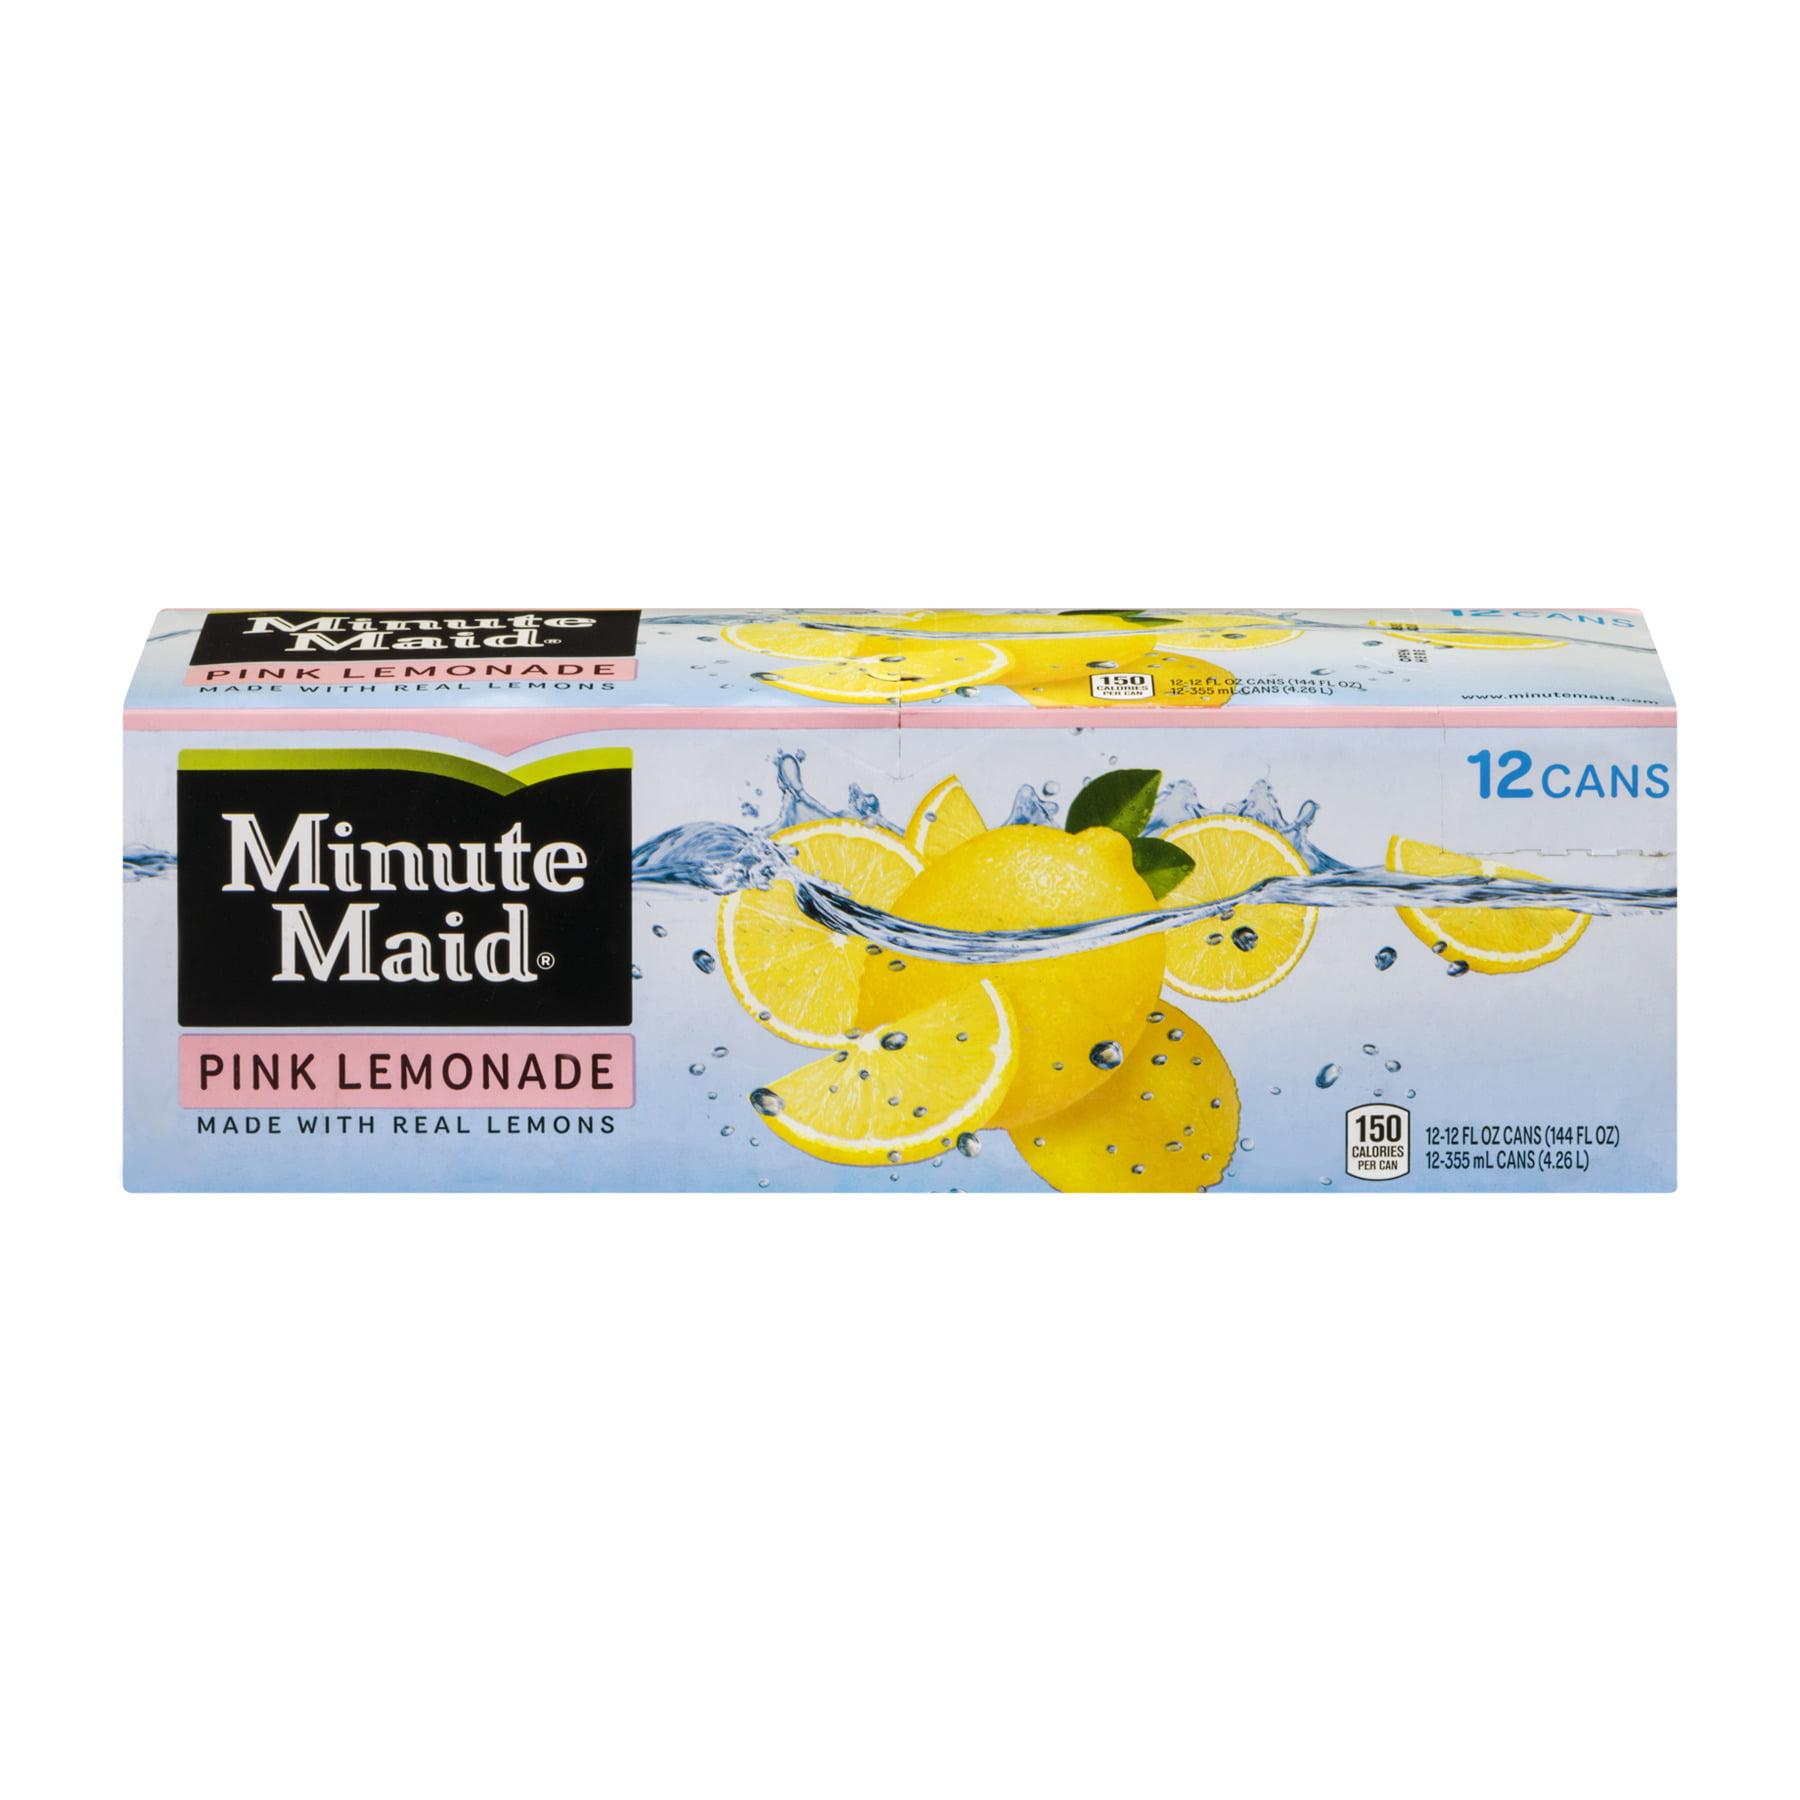 Minute Maid Pink Lemonade, 12 count